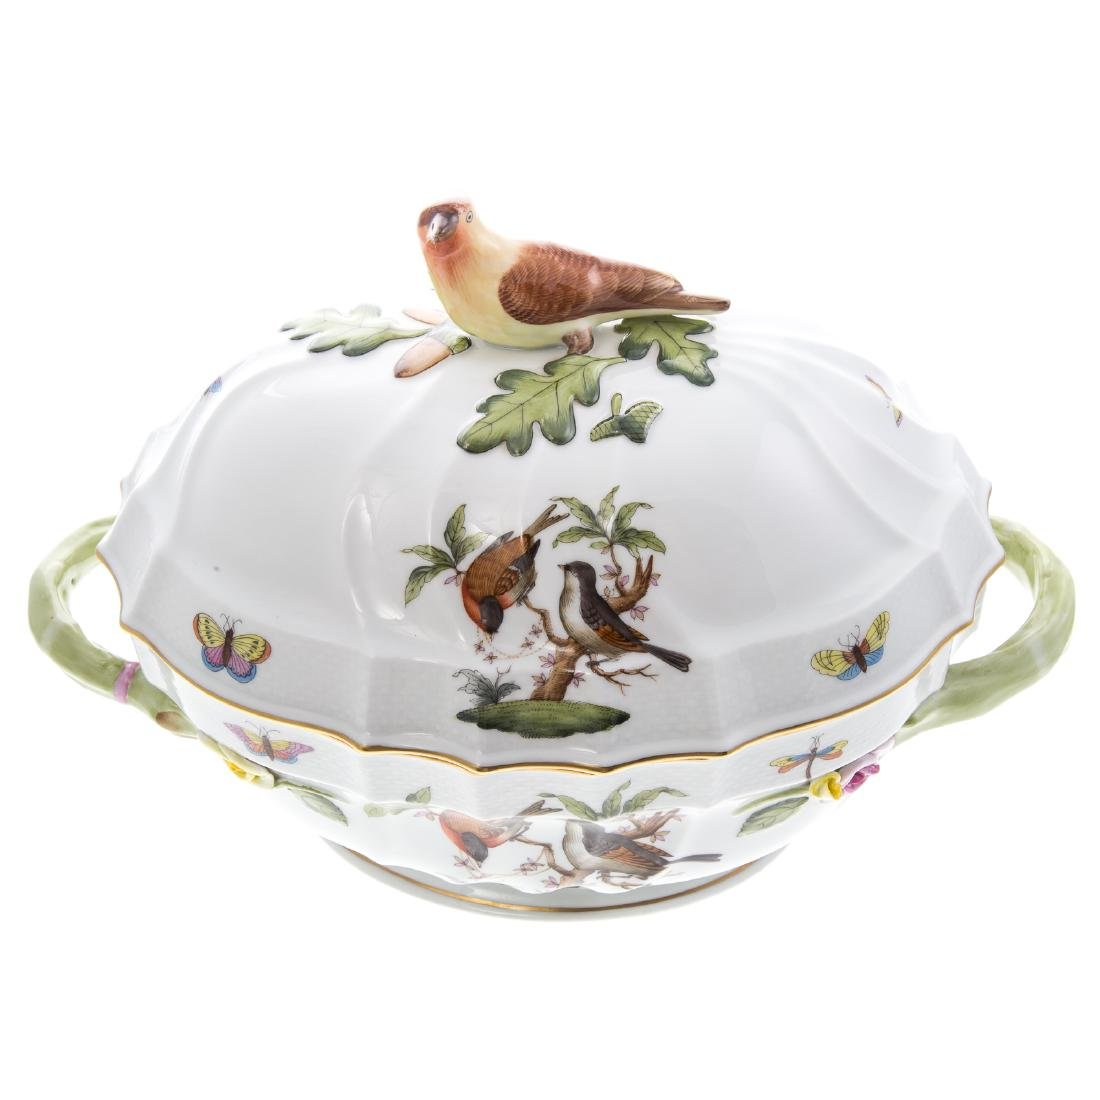 Herend Rothschild Bird soup tureen and platter - 4